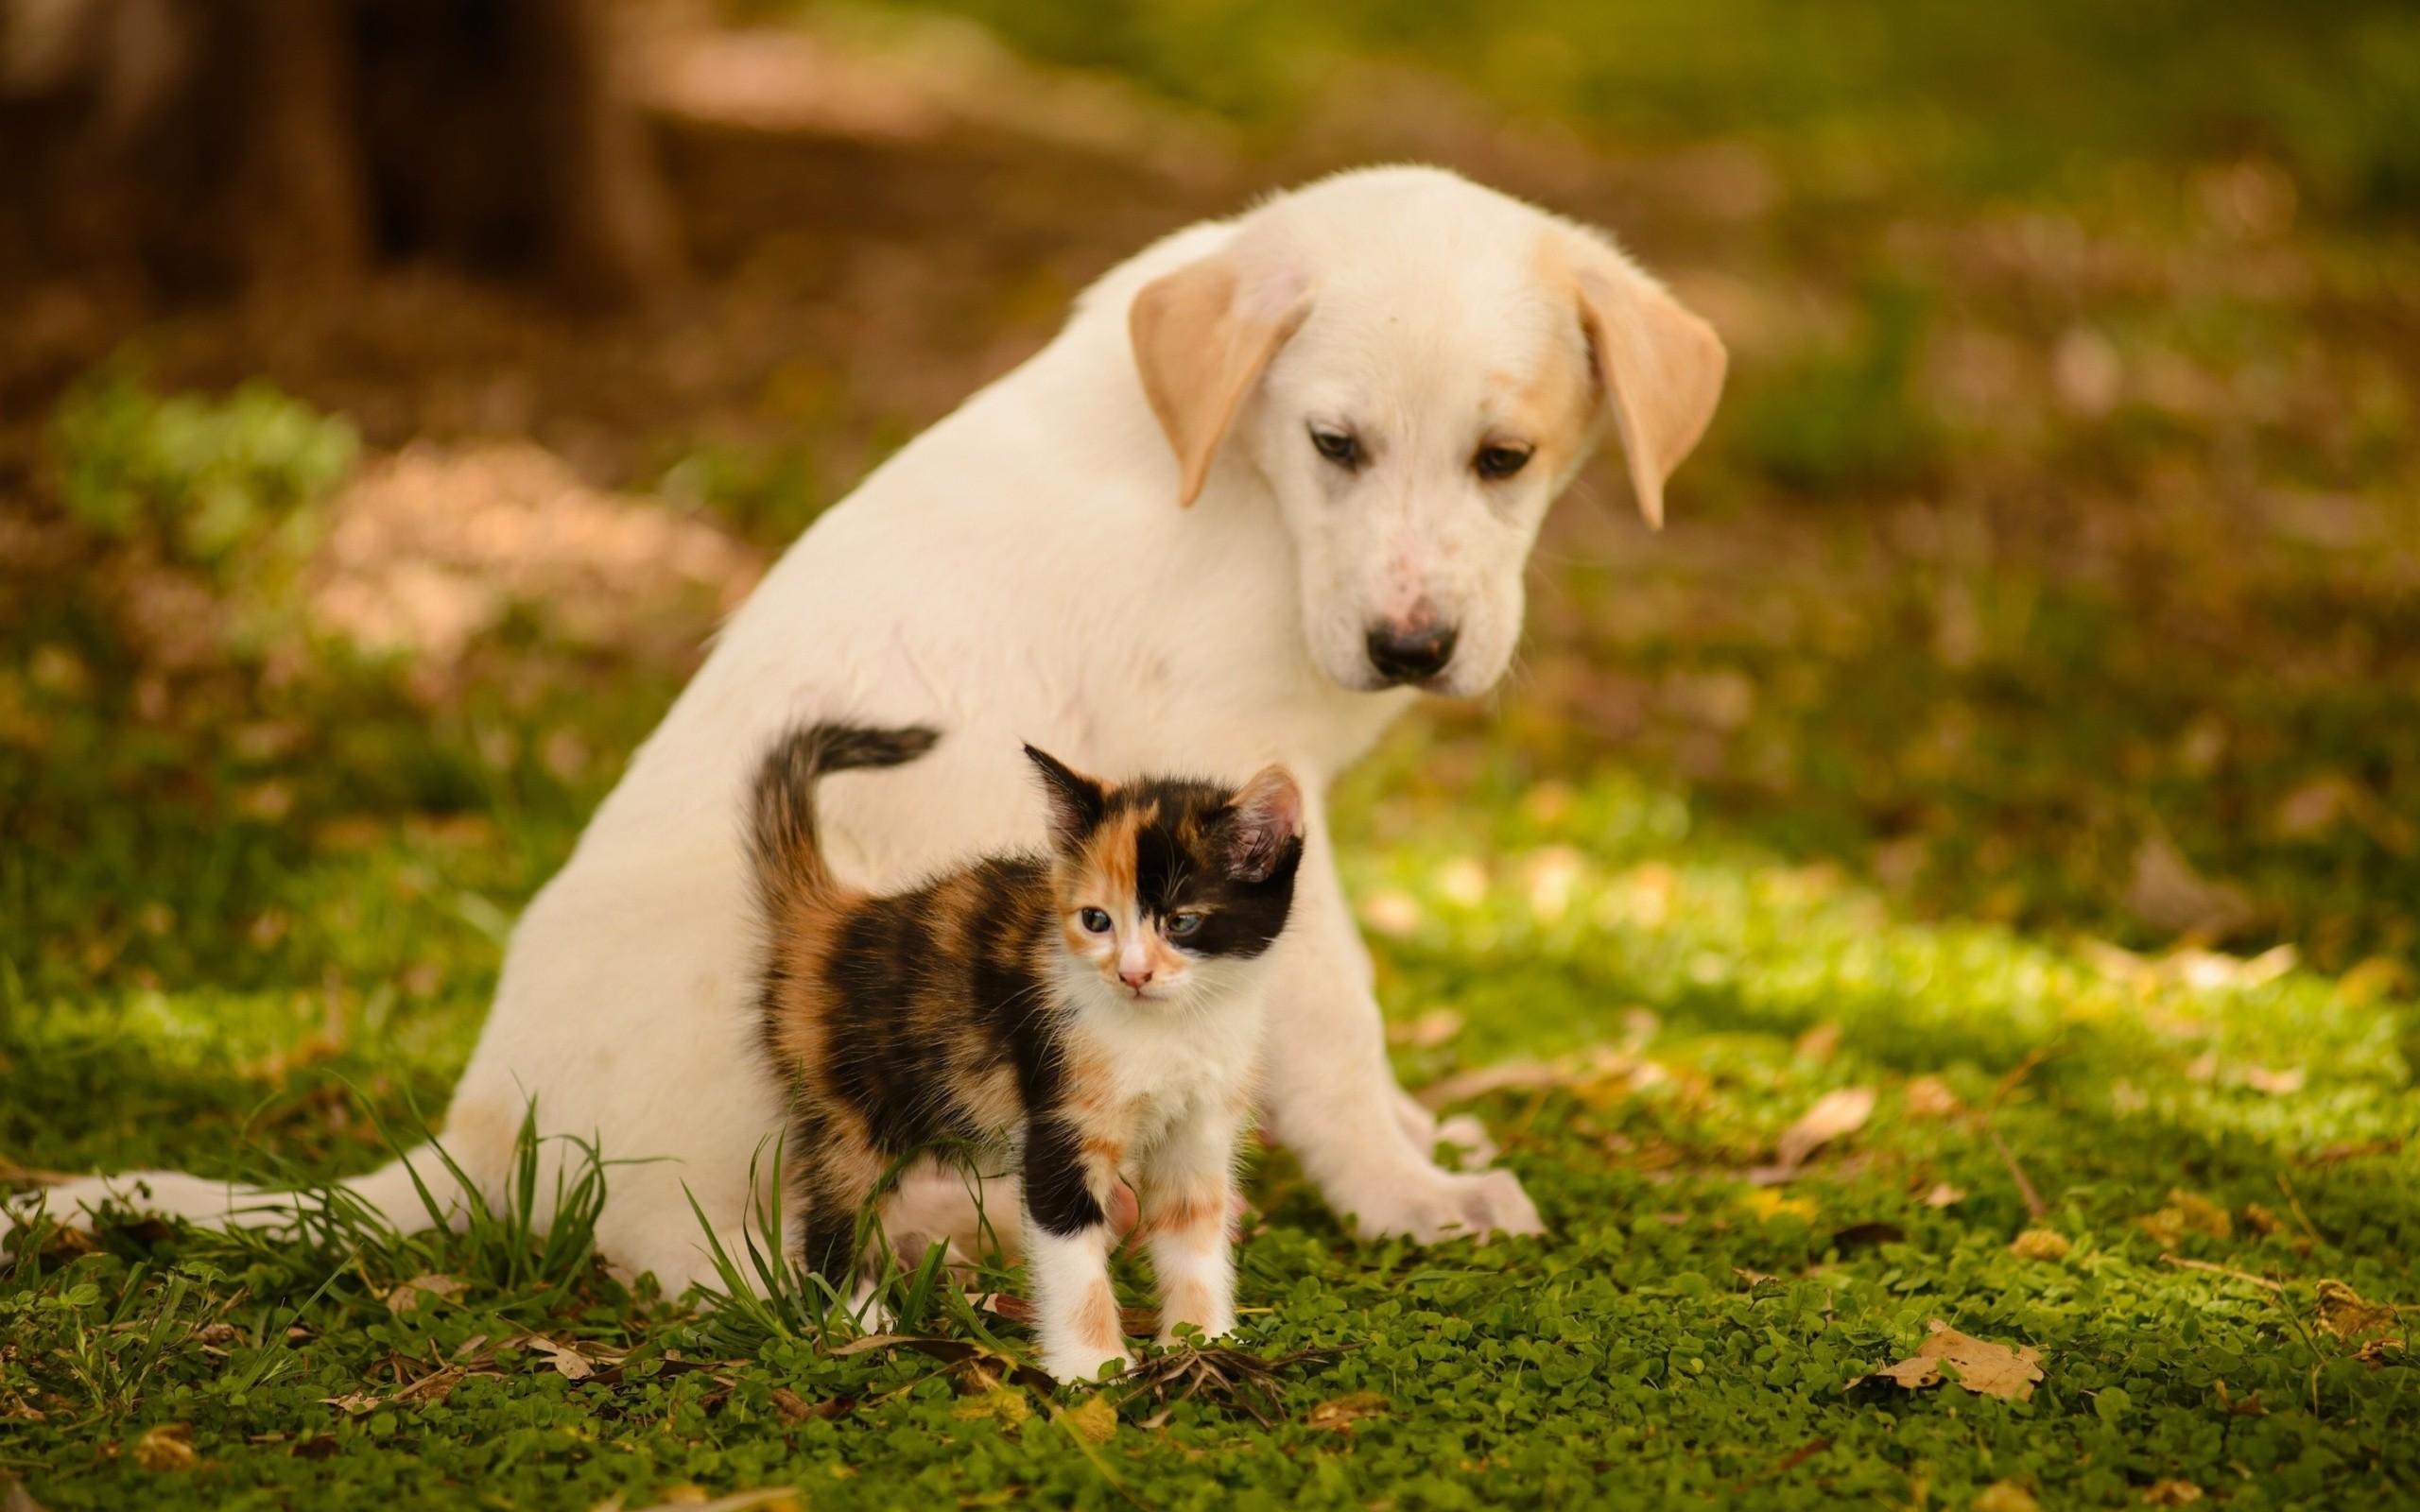 Animal – Cute Animal Dog Cat Puppy Kitten Wallpaper